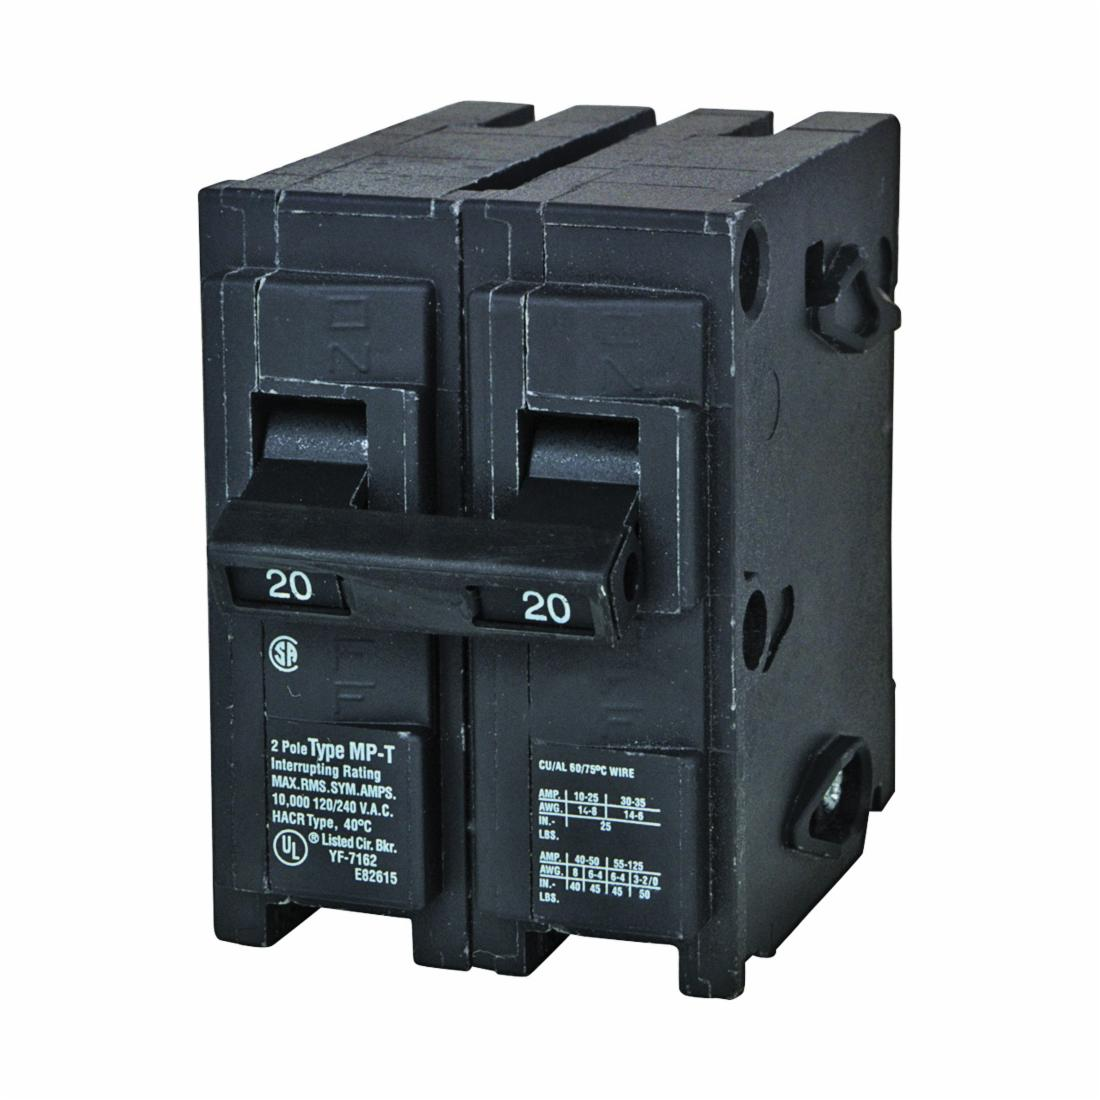 SIEMENS ENERGY MP260